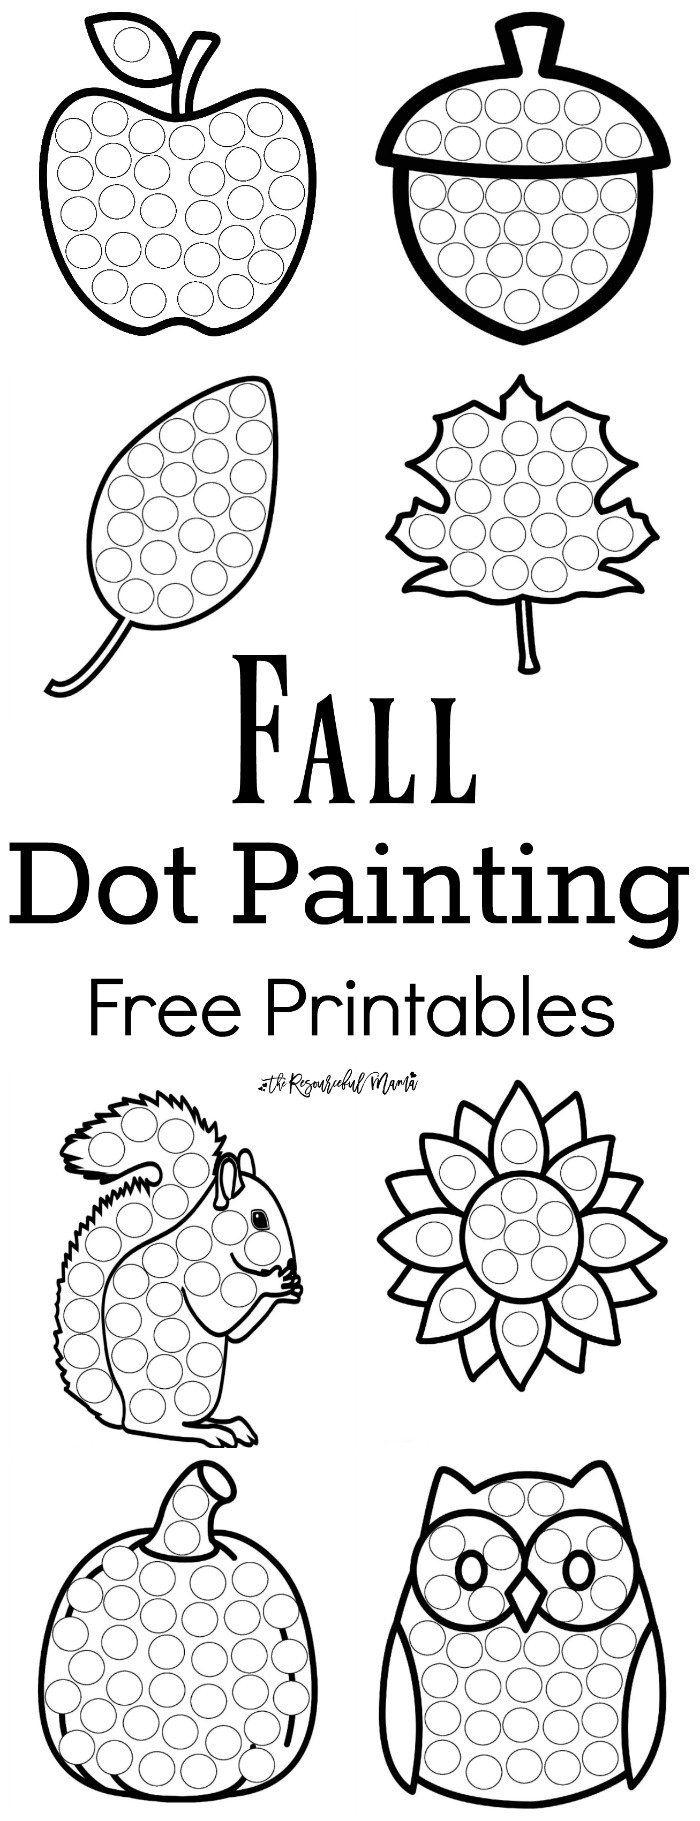 Fall Dot Painting {Free Printables} | Onderwijs | Herfst, Herfst - Free Dot Painting Printables